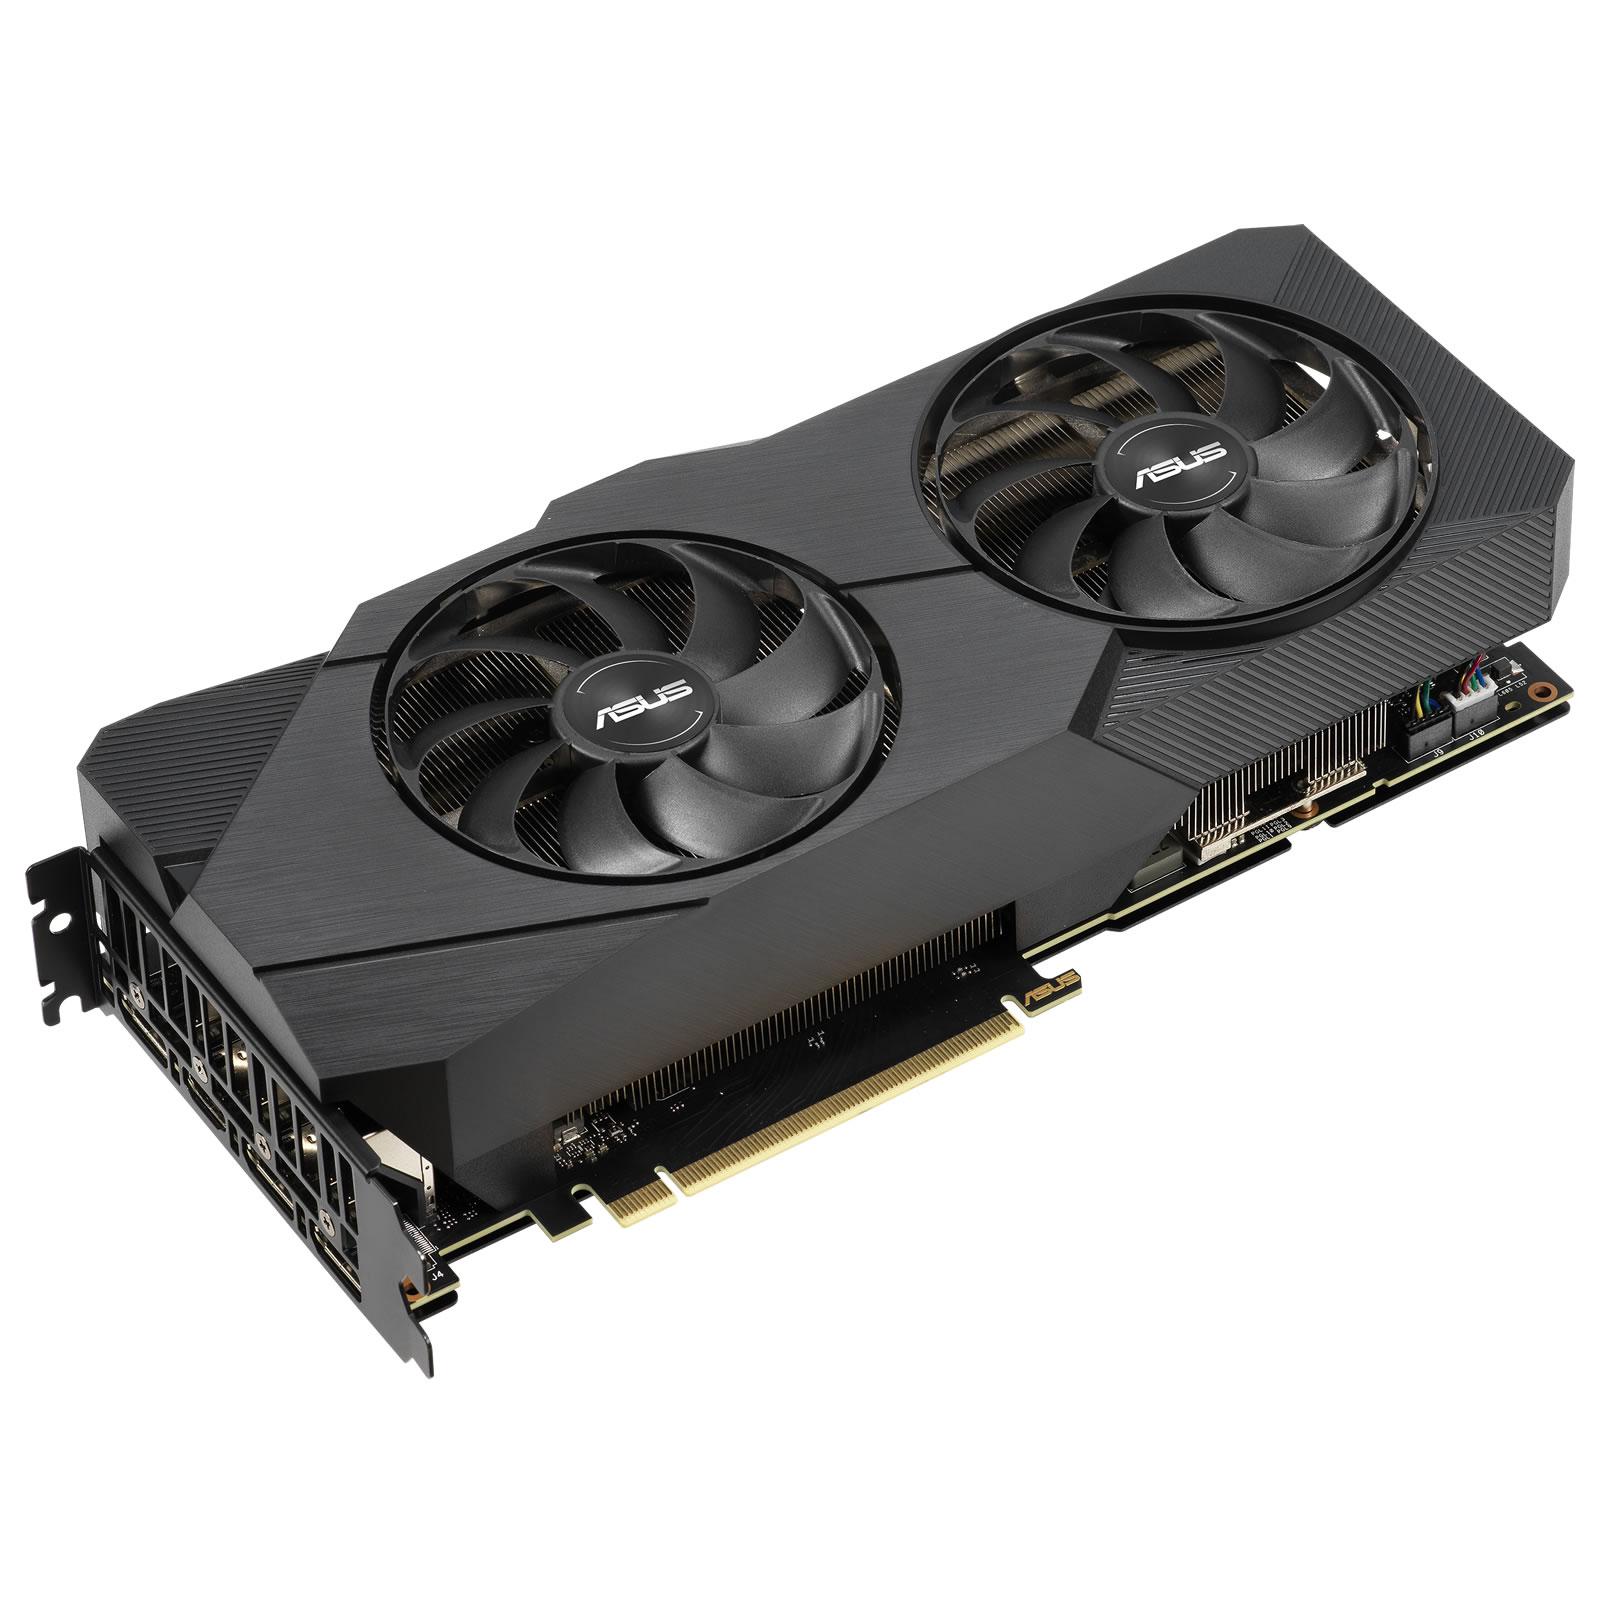 ASUS Radeon RX 5700 XT Dual EVO